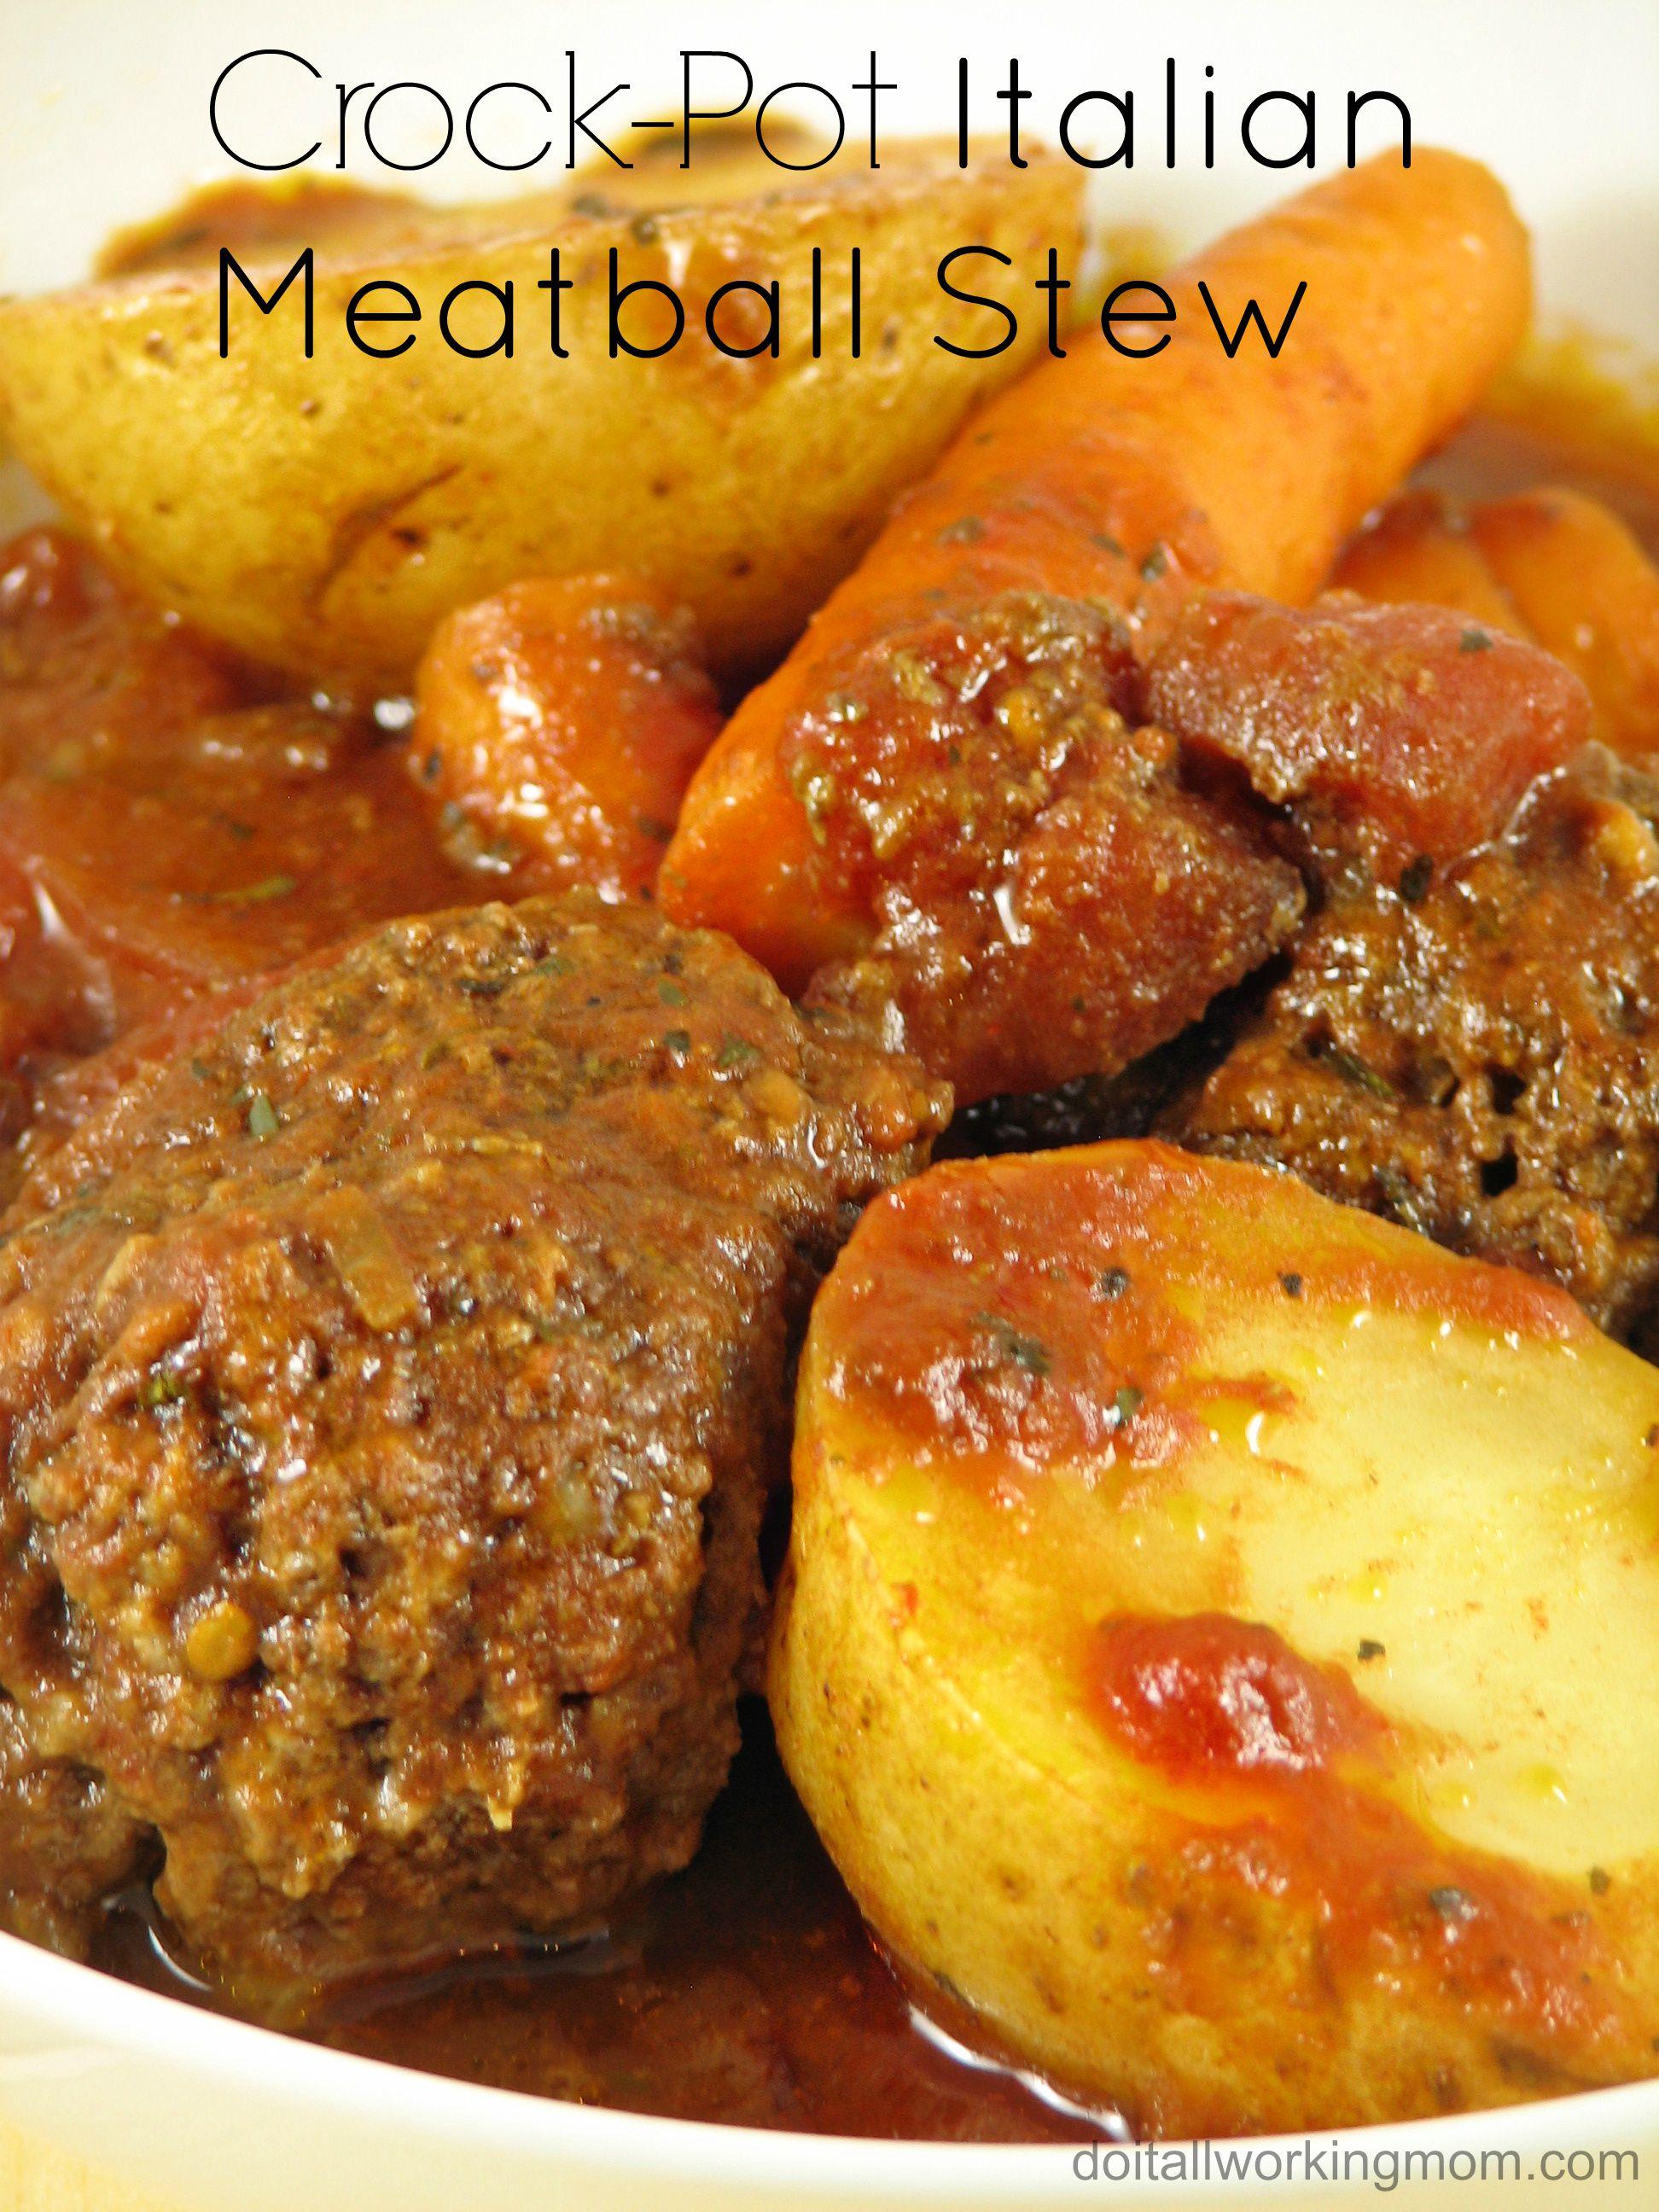 Crock-Pot Italian Meatball Stew